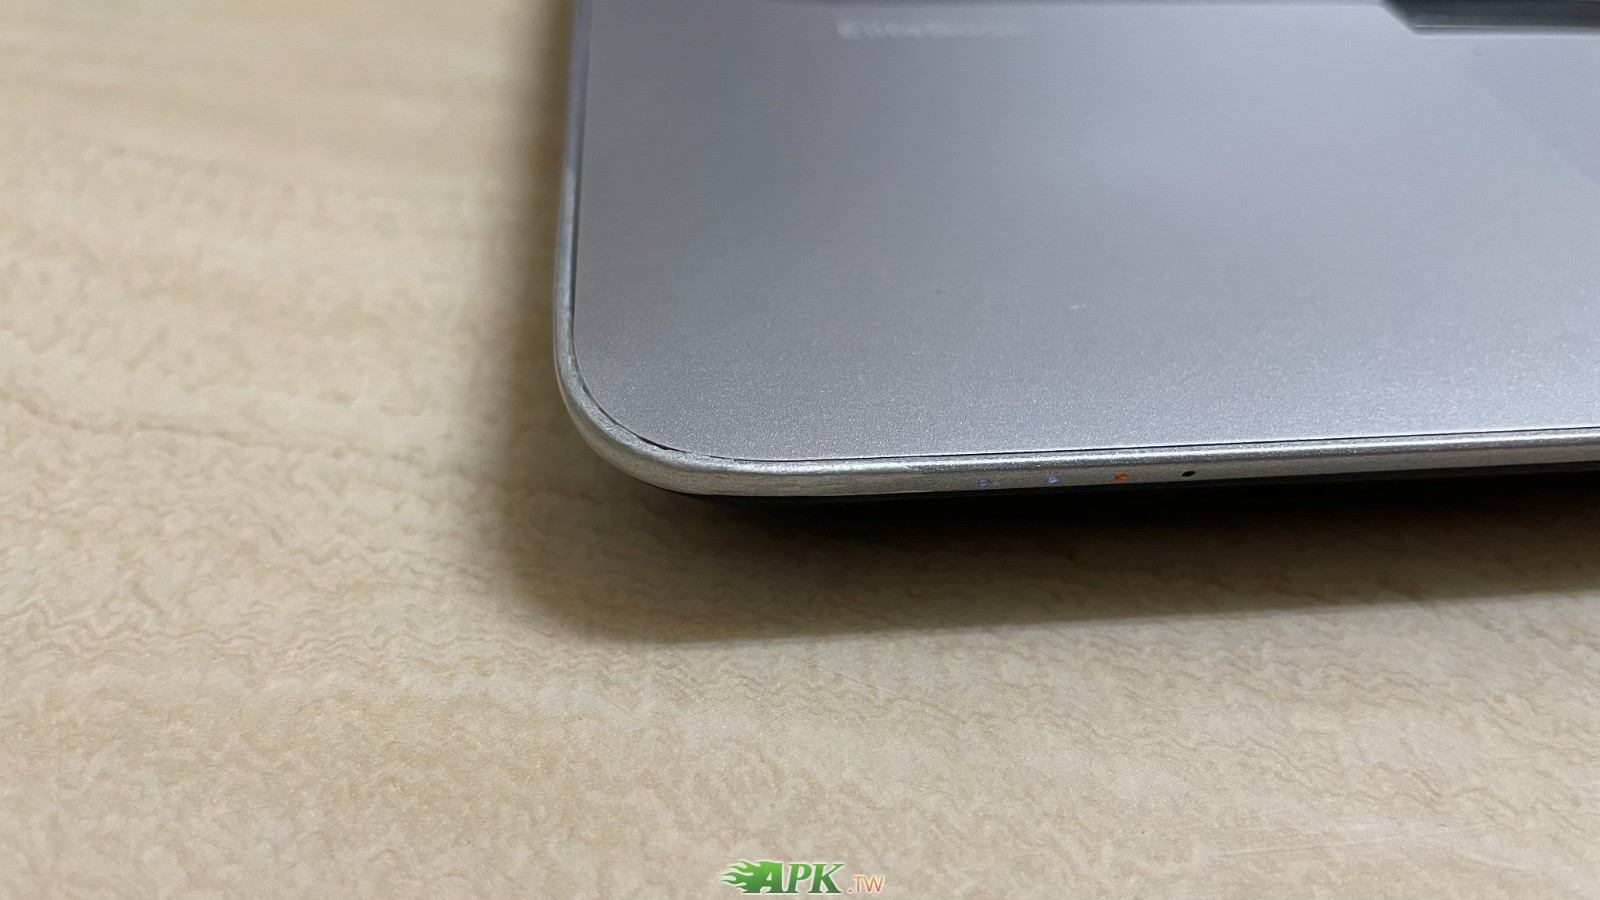 HP 惠普 EliteBook 745 G3 AMD 處理器 +視訊鏡頭+雙硬碟-14吋筆電-2016年出廠